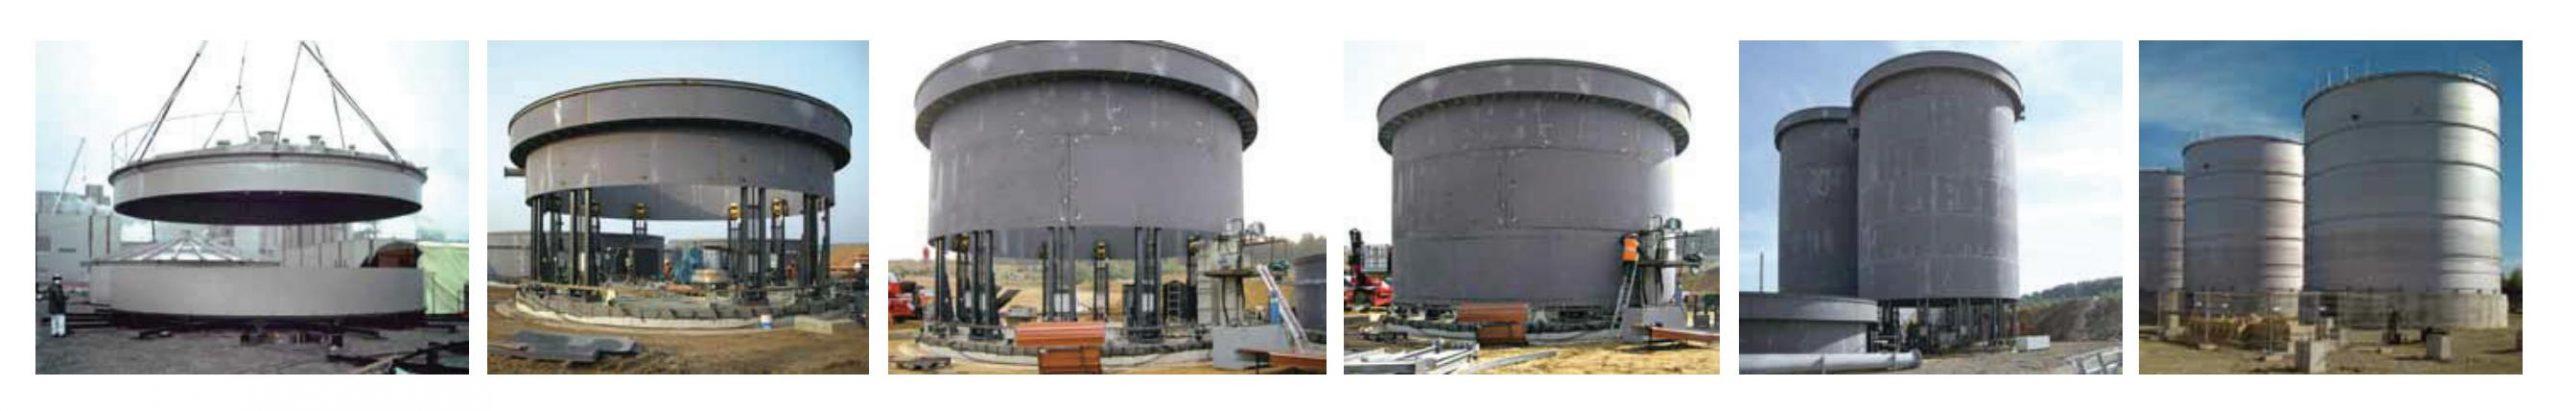 IMCAR vertical tank fabrication 1